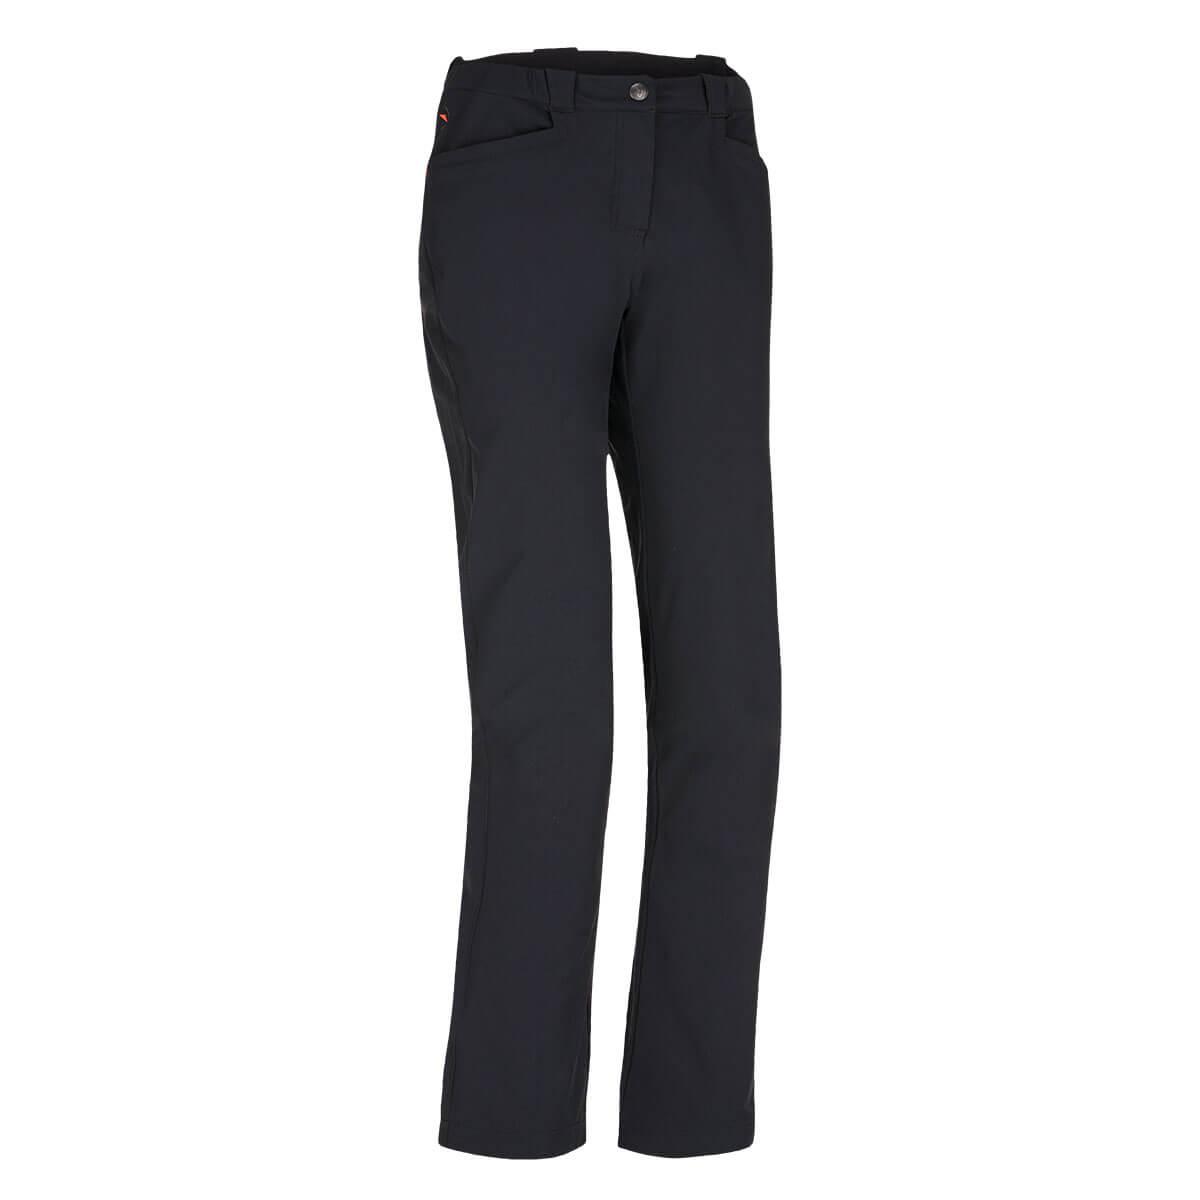 Nohavice Zajo Grip Neo W Pants Black/Fluo Coral - veľkosť S